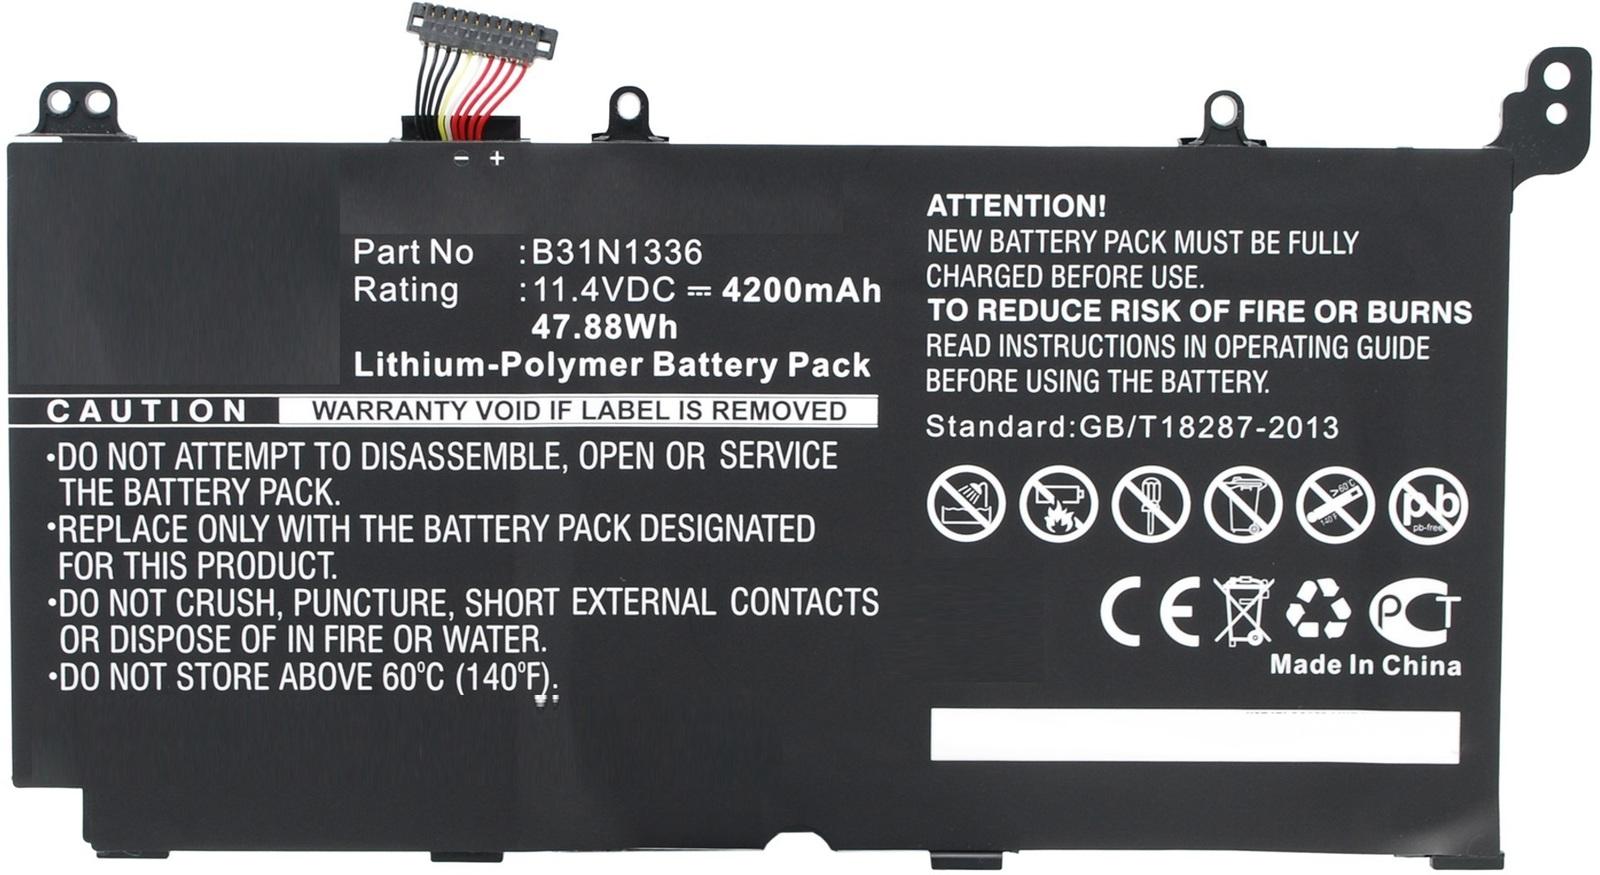 MicroBattery Laptop Battery for Asus 47.88Wh Li-Pol 11.4V 4200mAh MBXAS-BA0034 - eet01